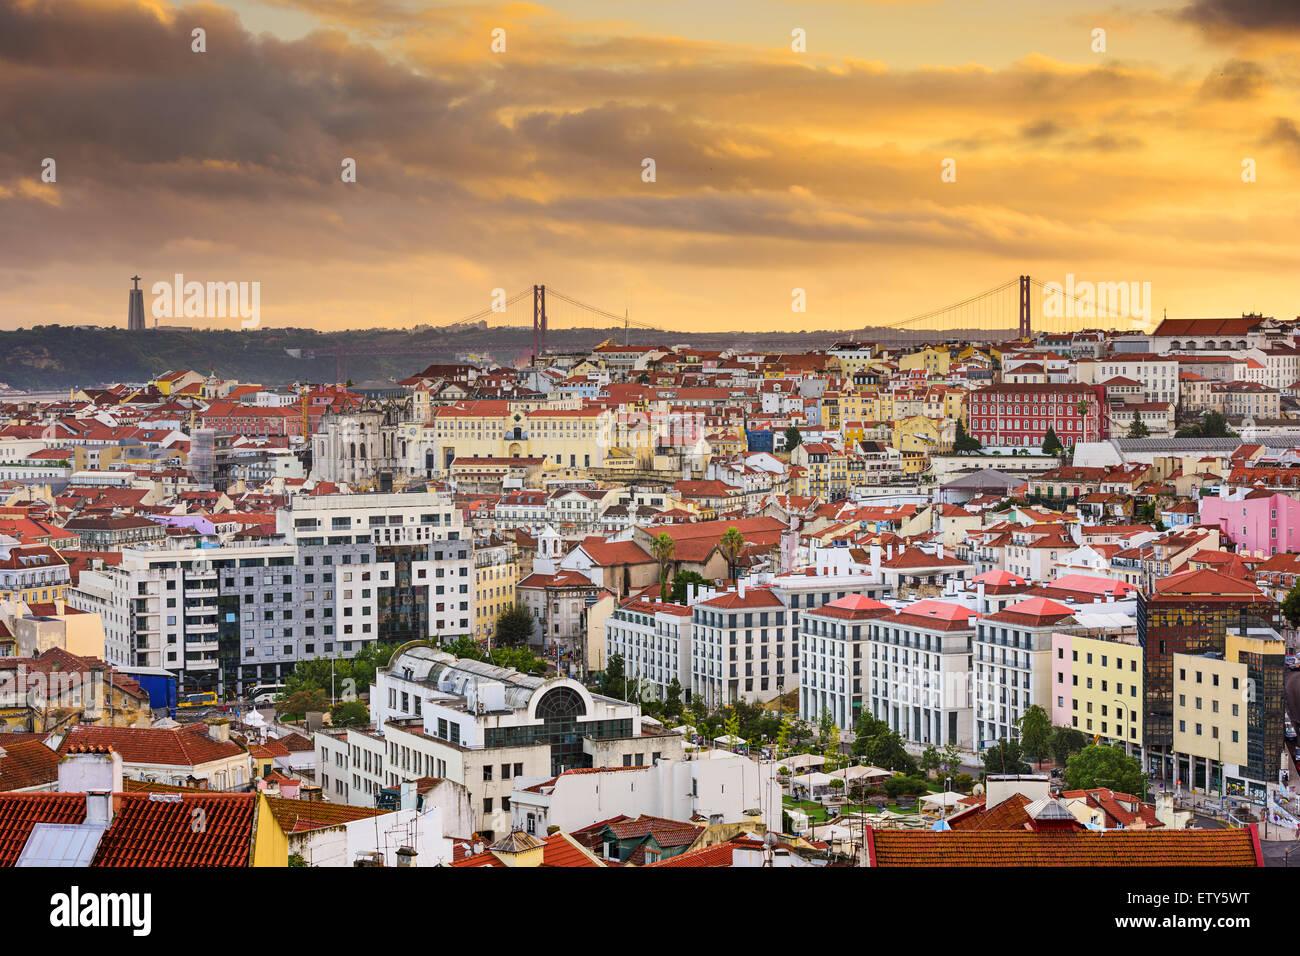 Lisbon, Portugal skyline at sunset. - Stock Image